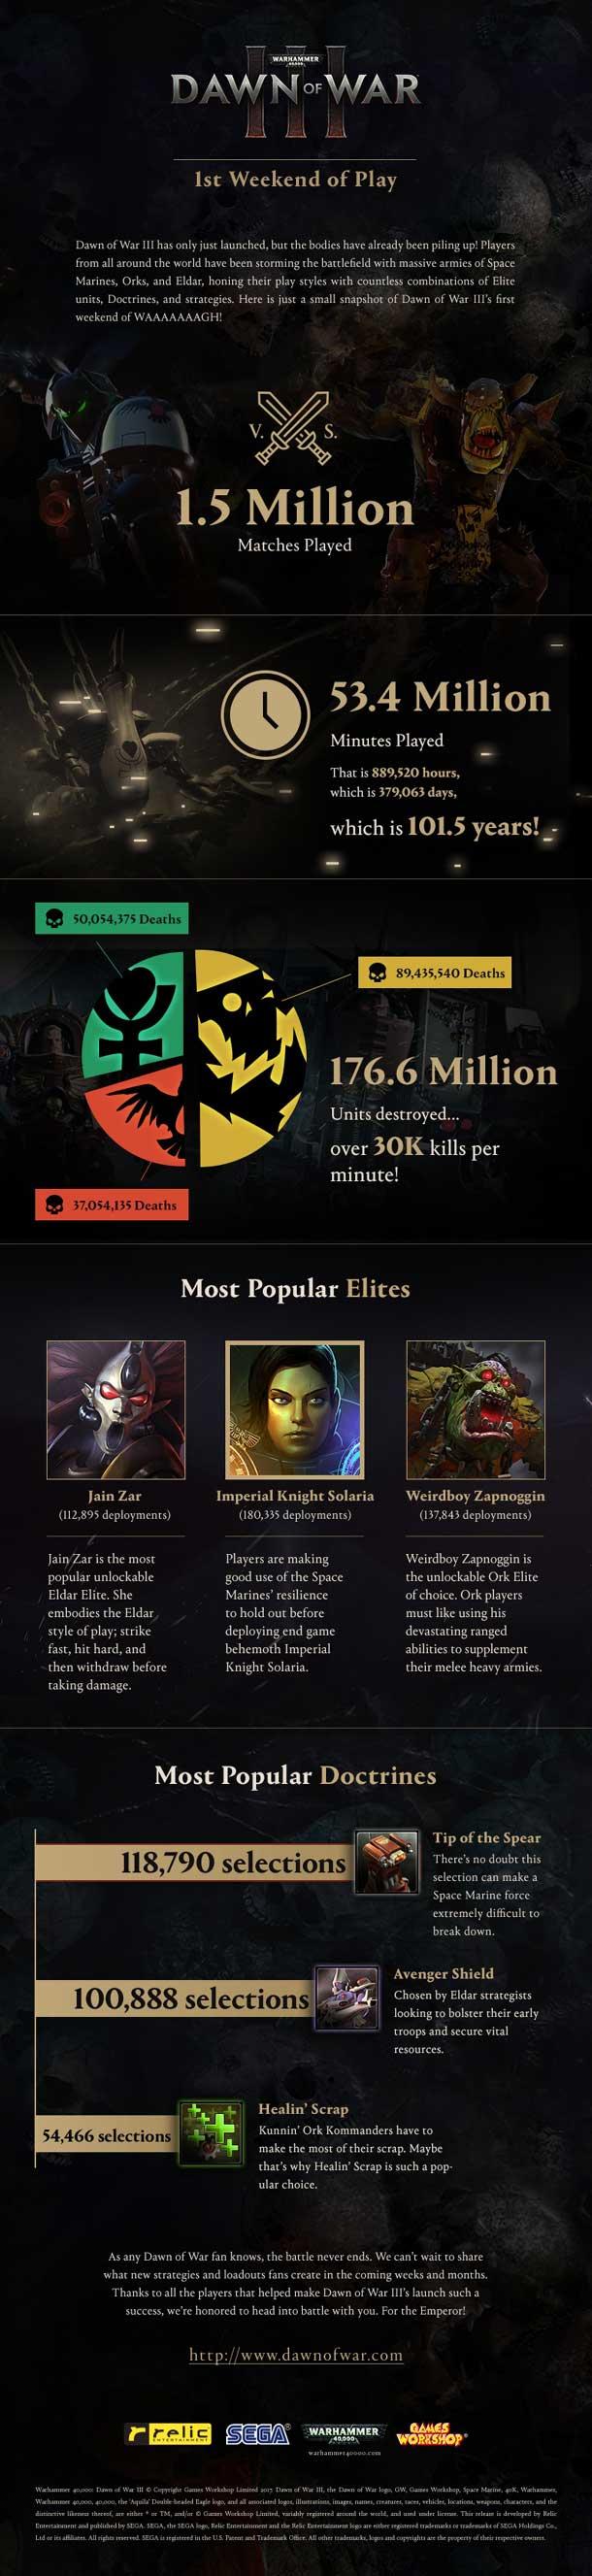 infografia lanzamiento de Warhammer 40000 Dawn of War III